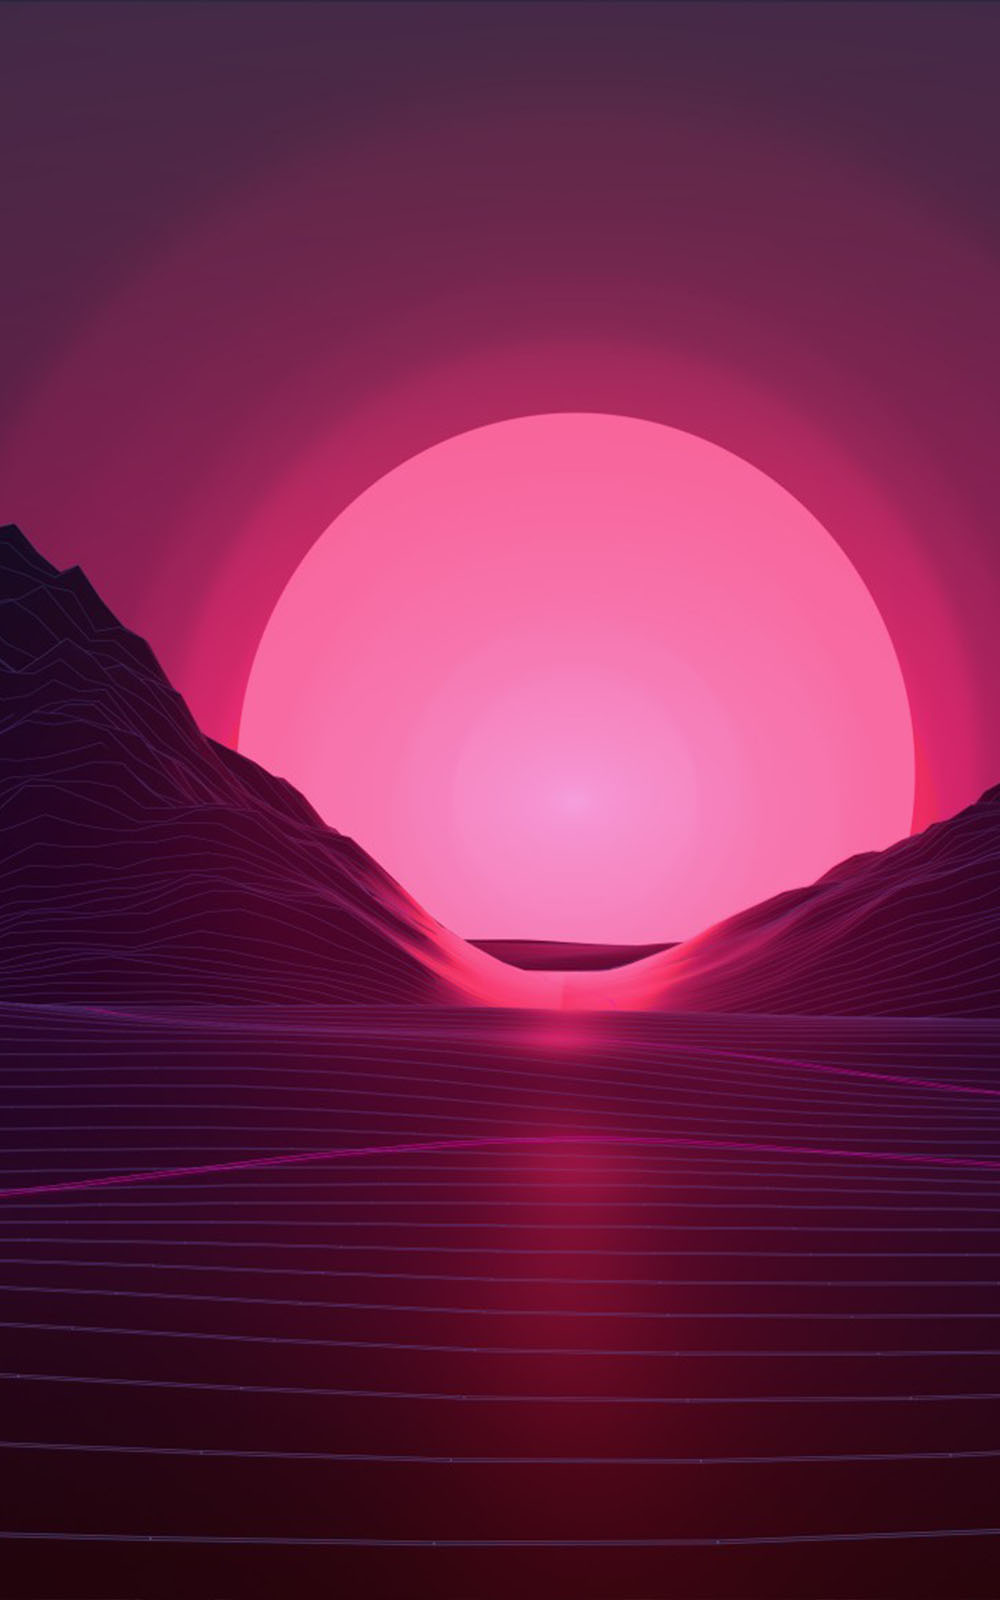 Cars Full Movie Online Free >> Neon Pink Sunset Artwork Free 4K Ultra HD Mobile Wallpaper